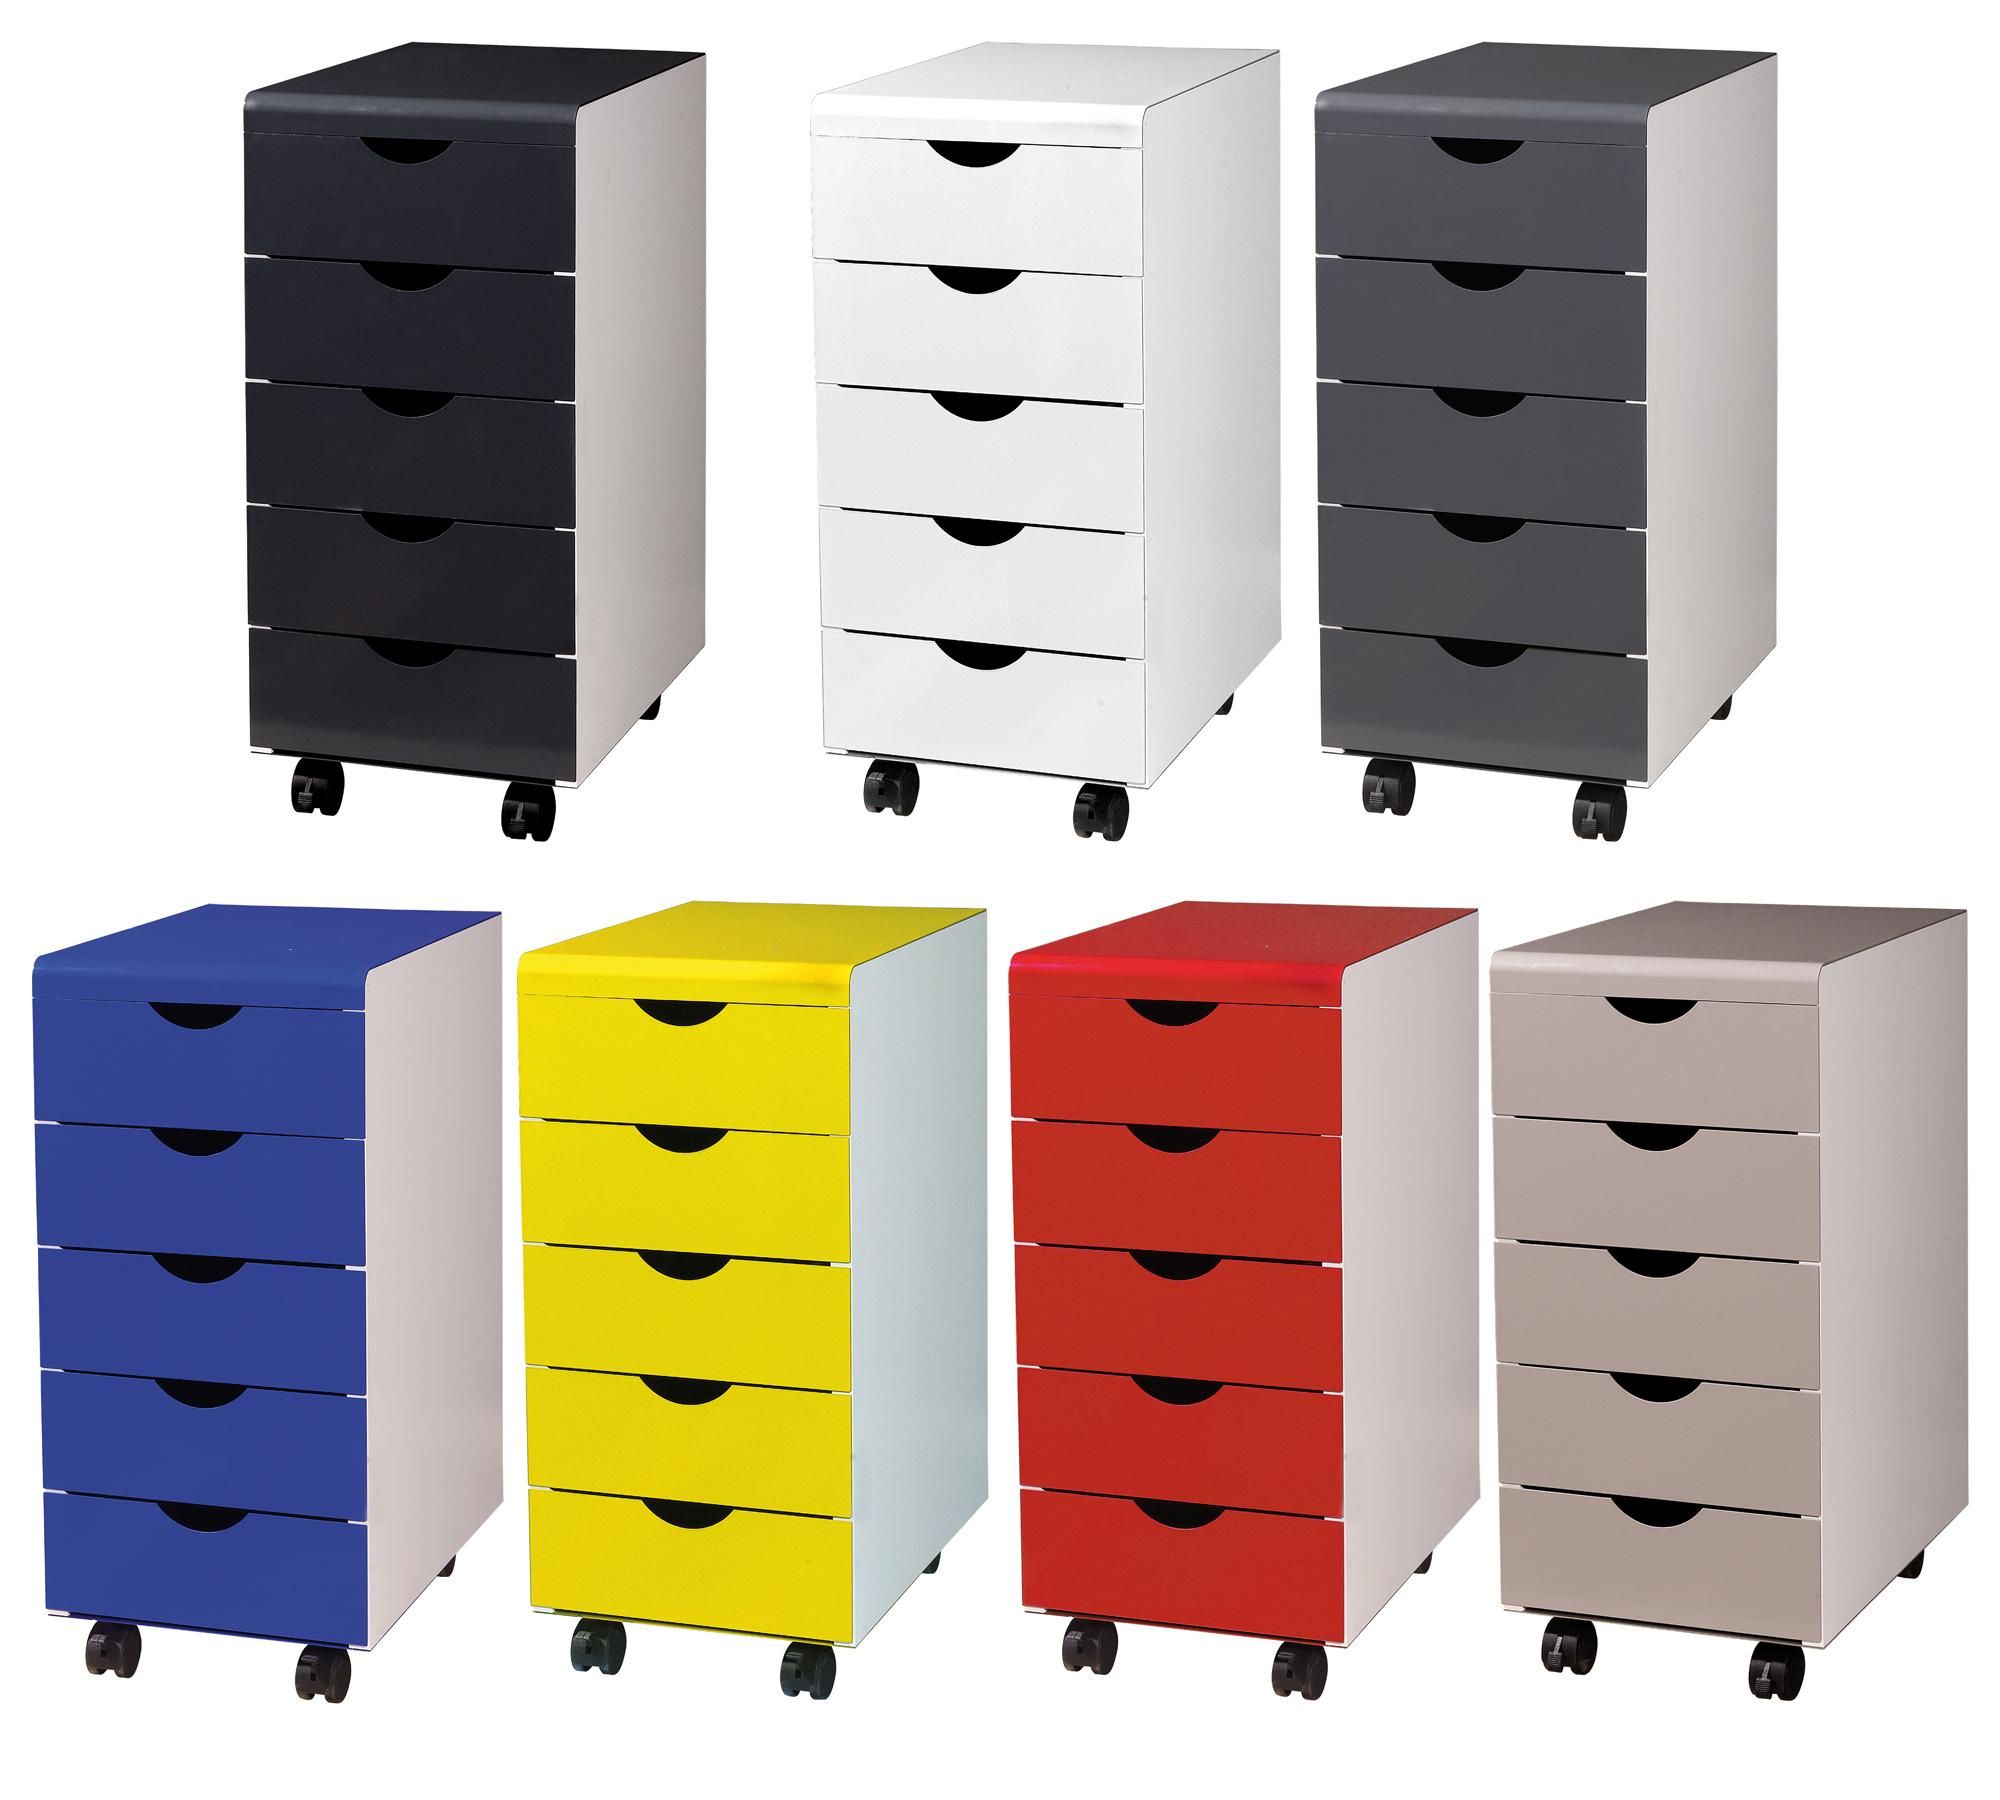 kommode nachtkommode nachtkonsole nachtschrank mod k534. Black Bedroom Furniture Sets. Home Design Ideas